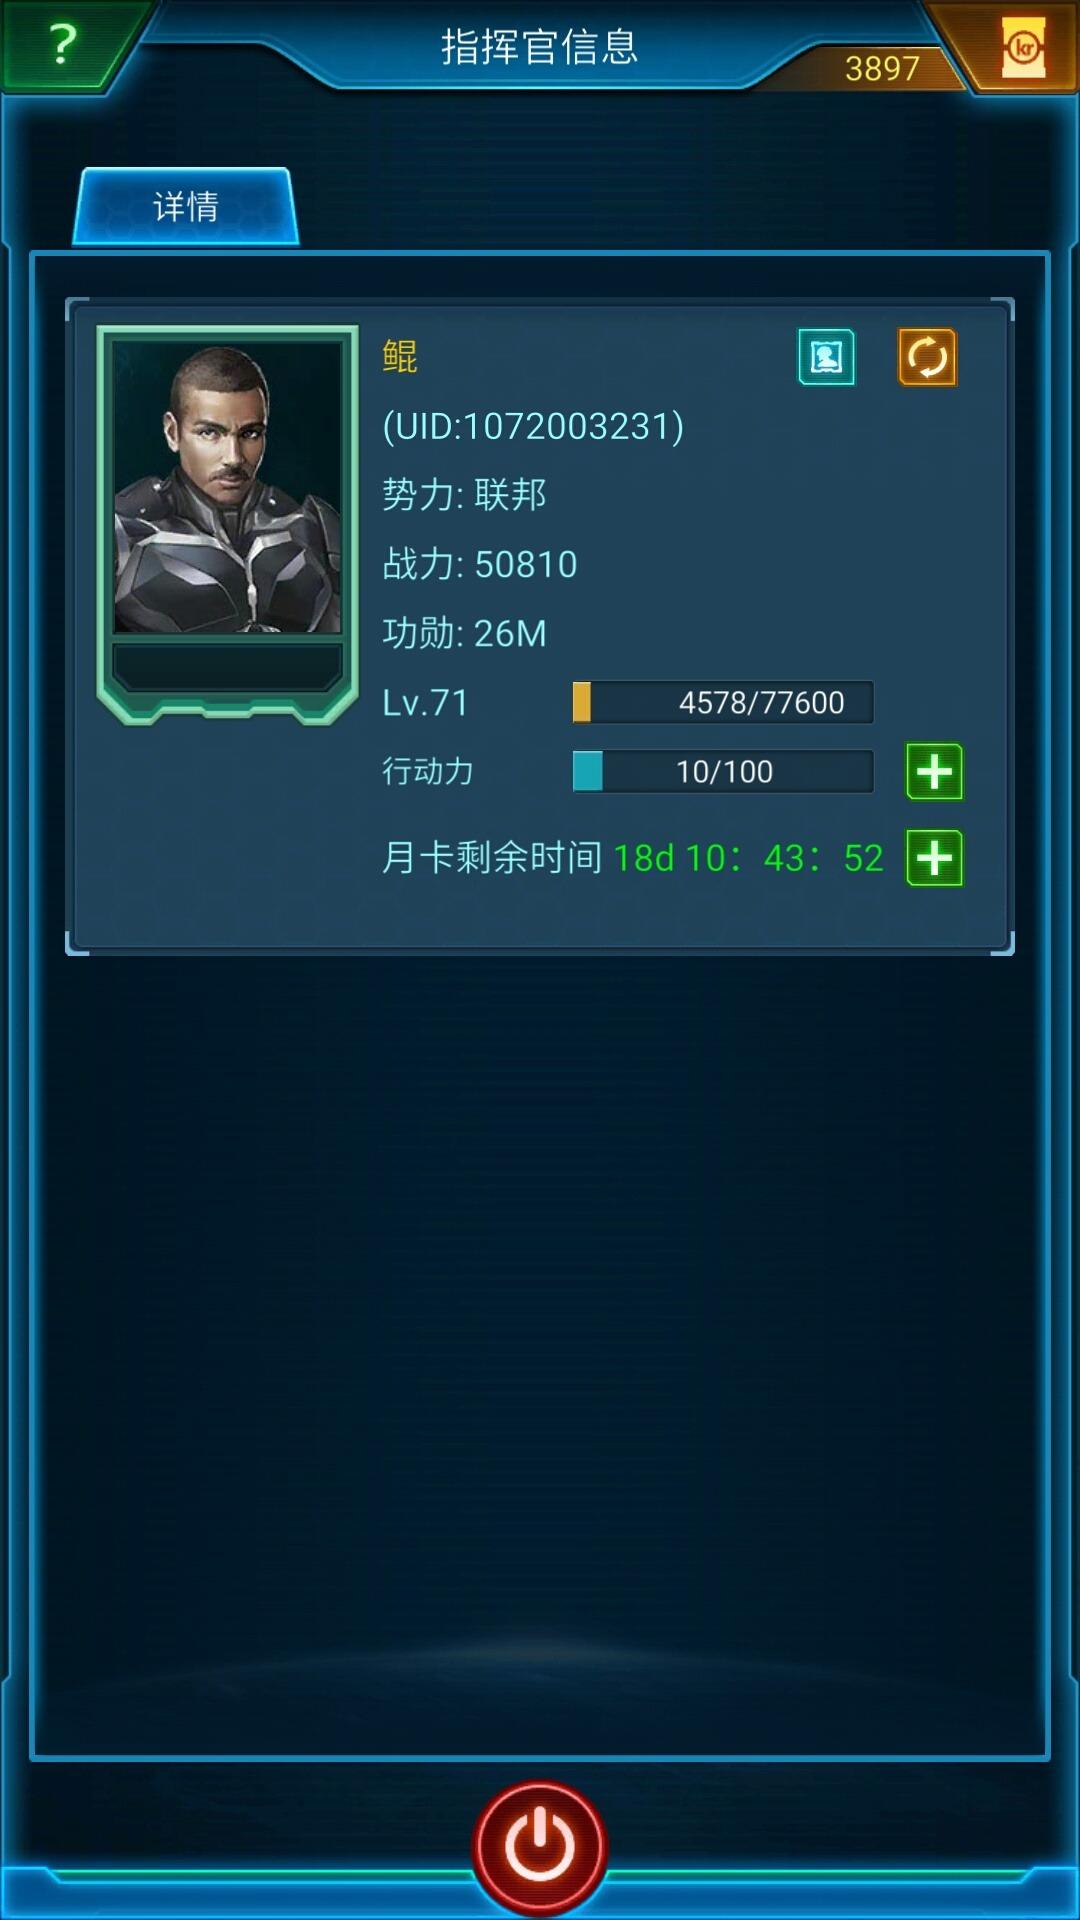 S80930-13160276.jpg